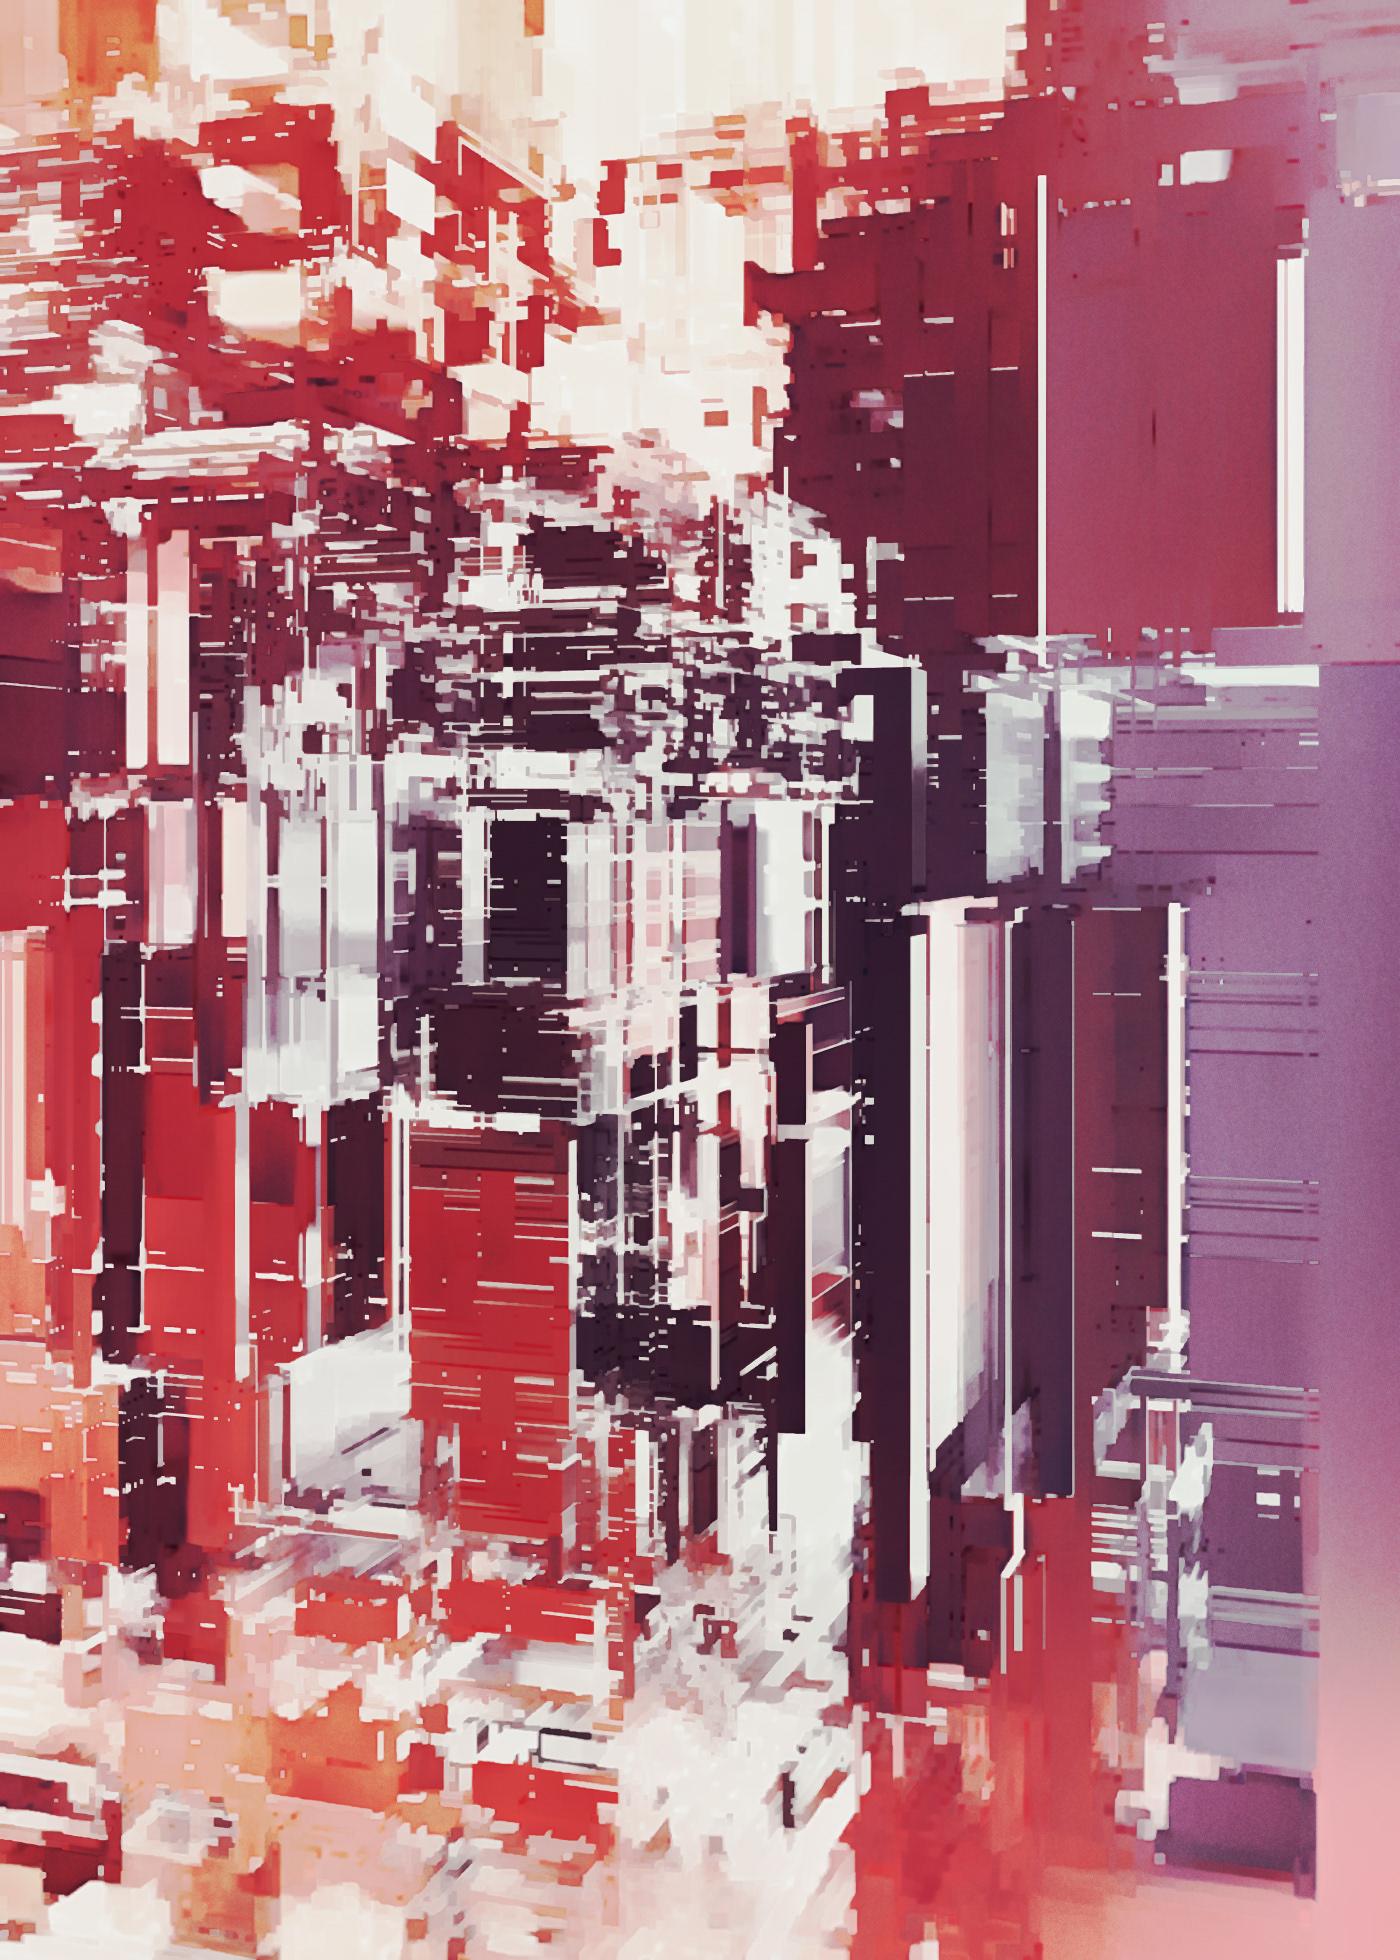 abstract city analog